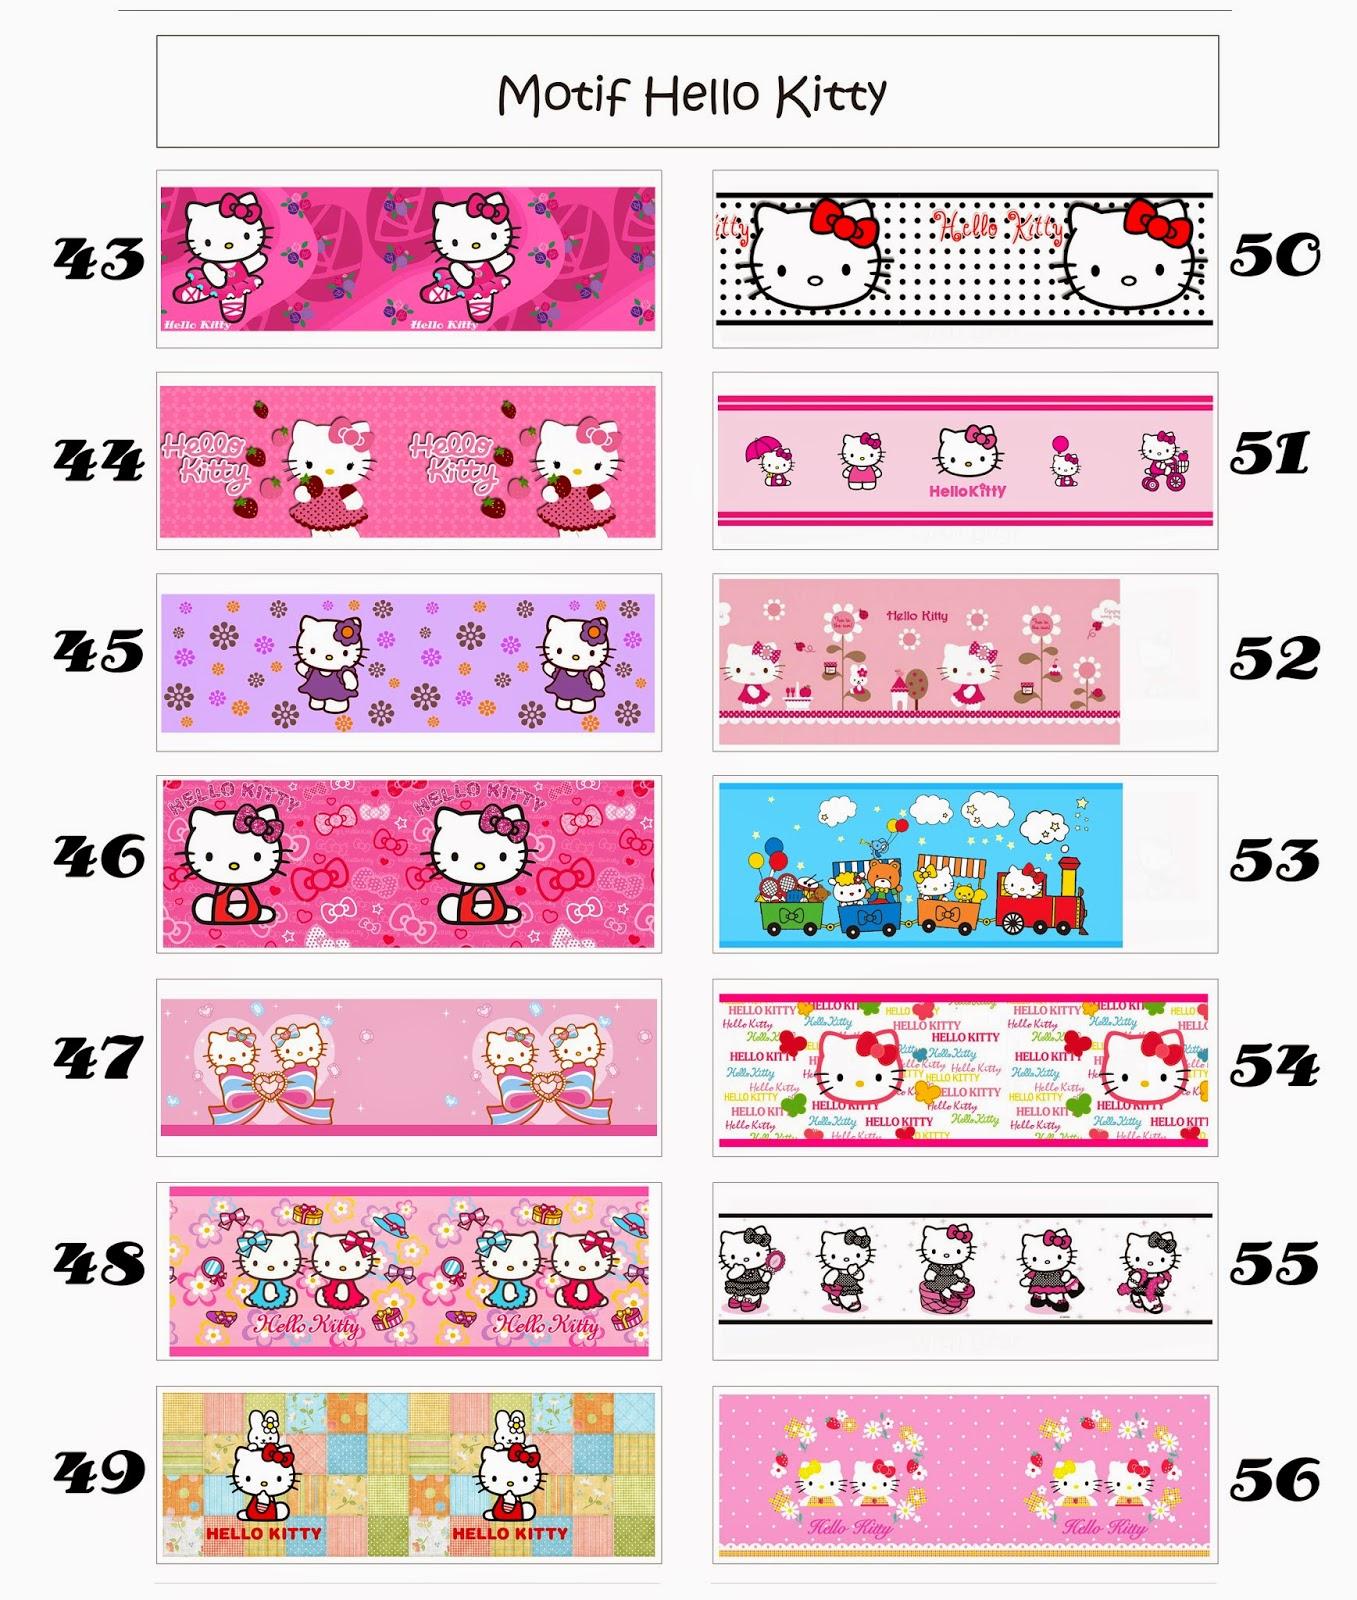 107 Harga Wallpaper Dinding Kamar Anak Hello Kitty Wallpaper Dinding